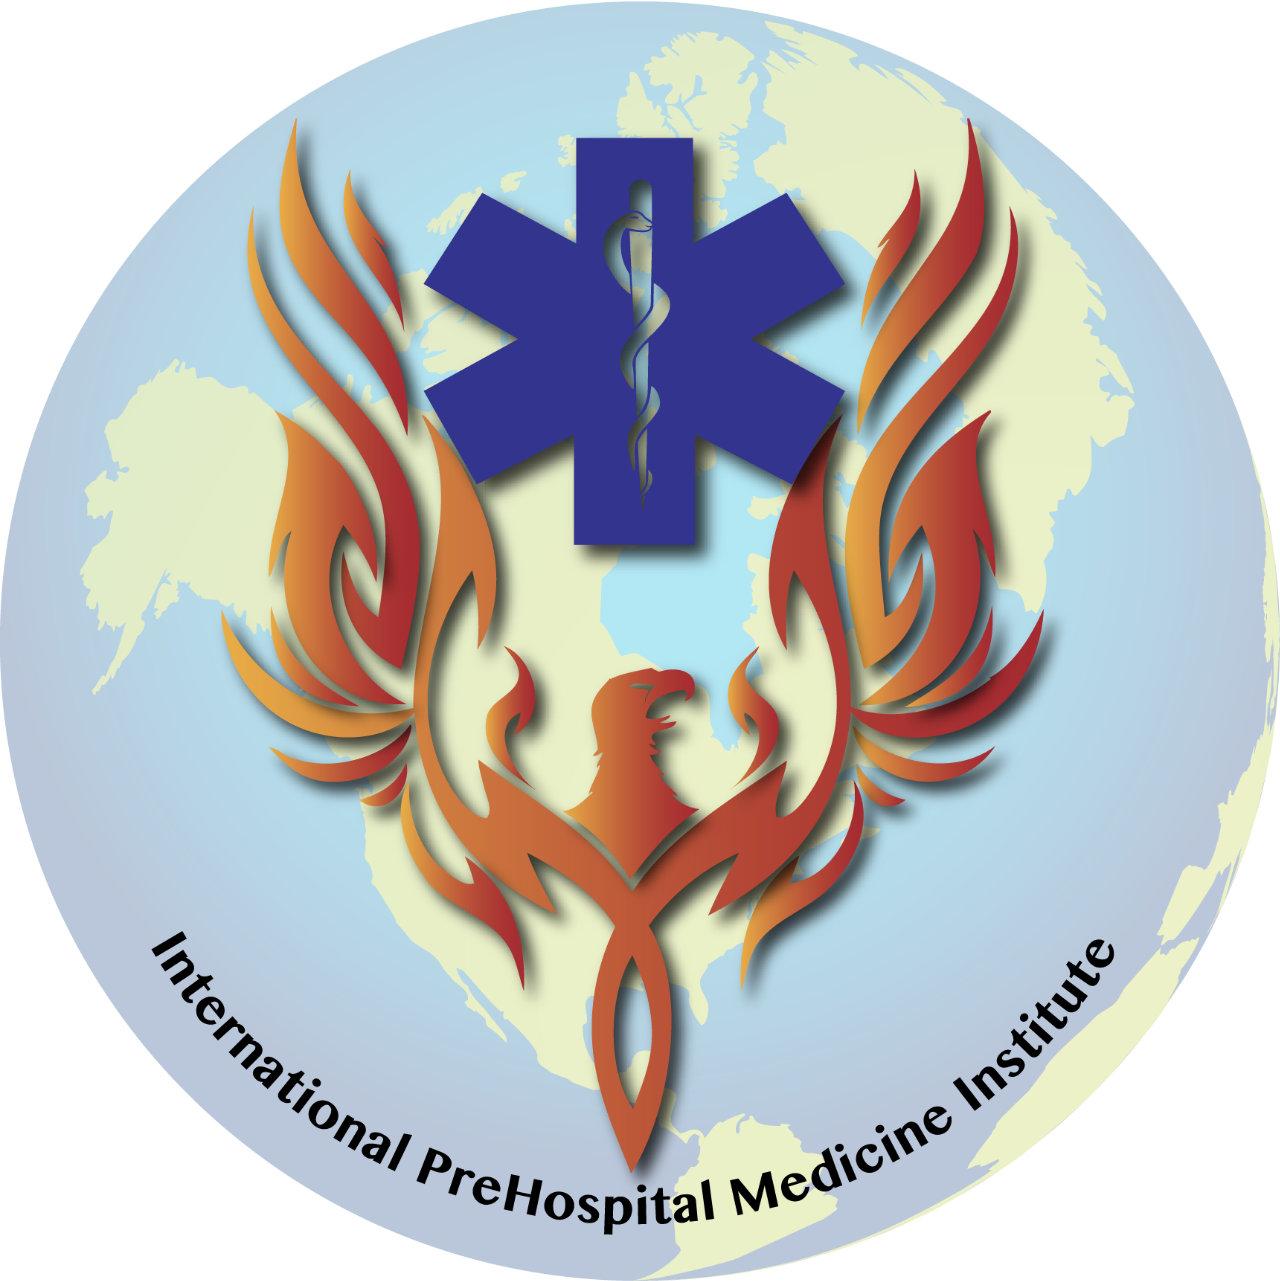 International Prehospital Medicine Institute Literature Review, August 2019